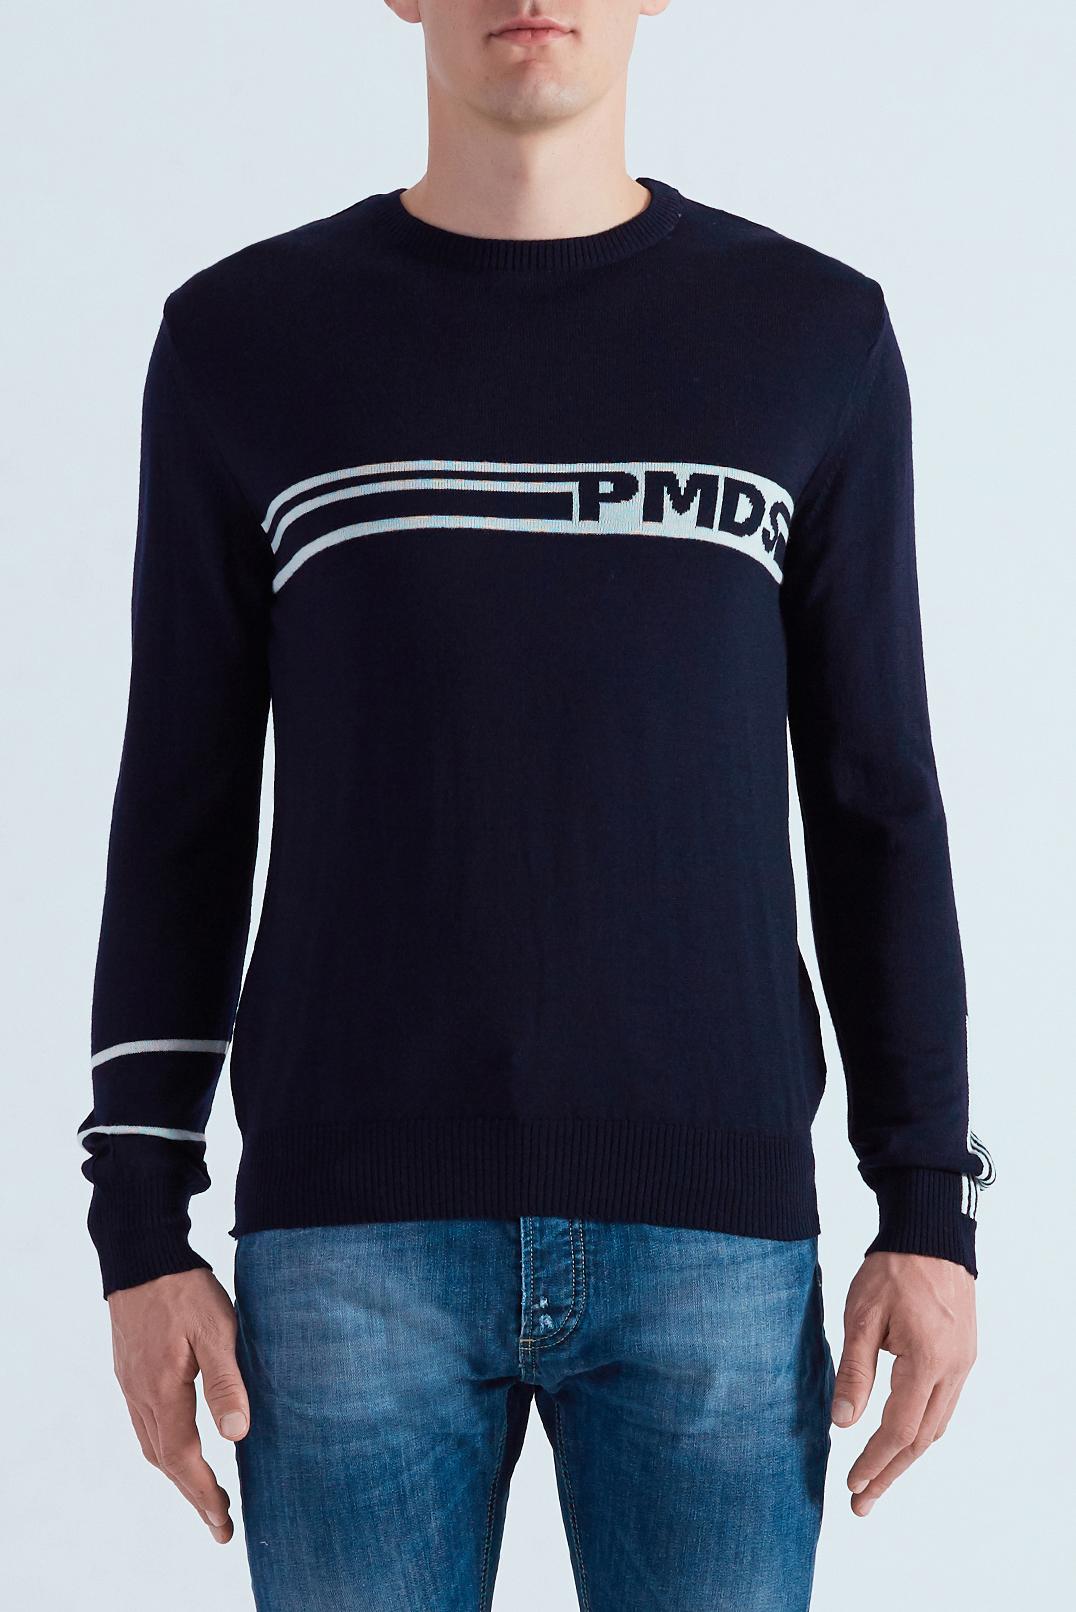 Свитер с логотипом PMDS PMDS29010